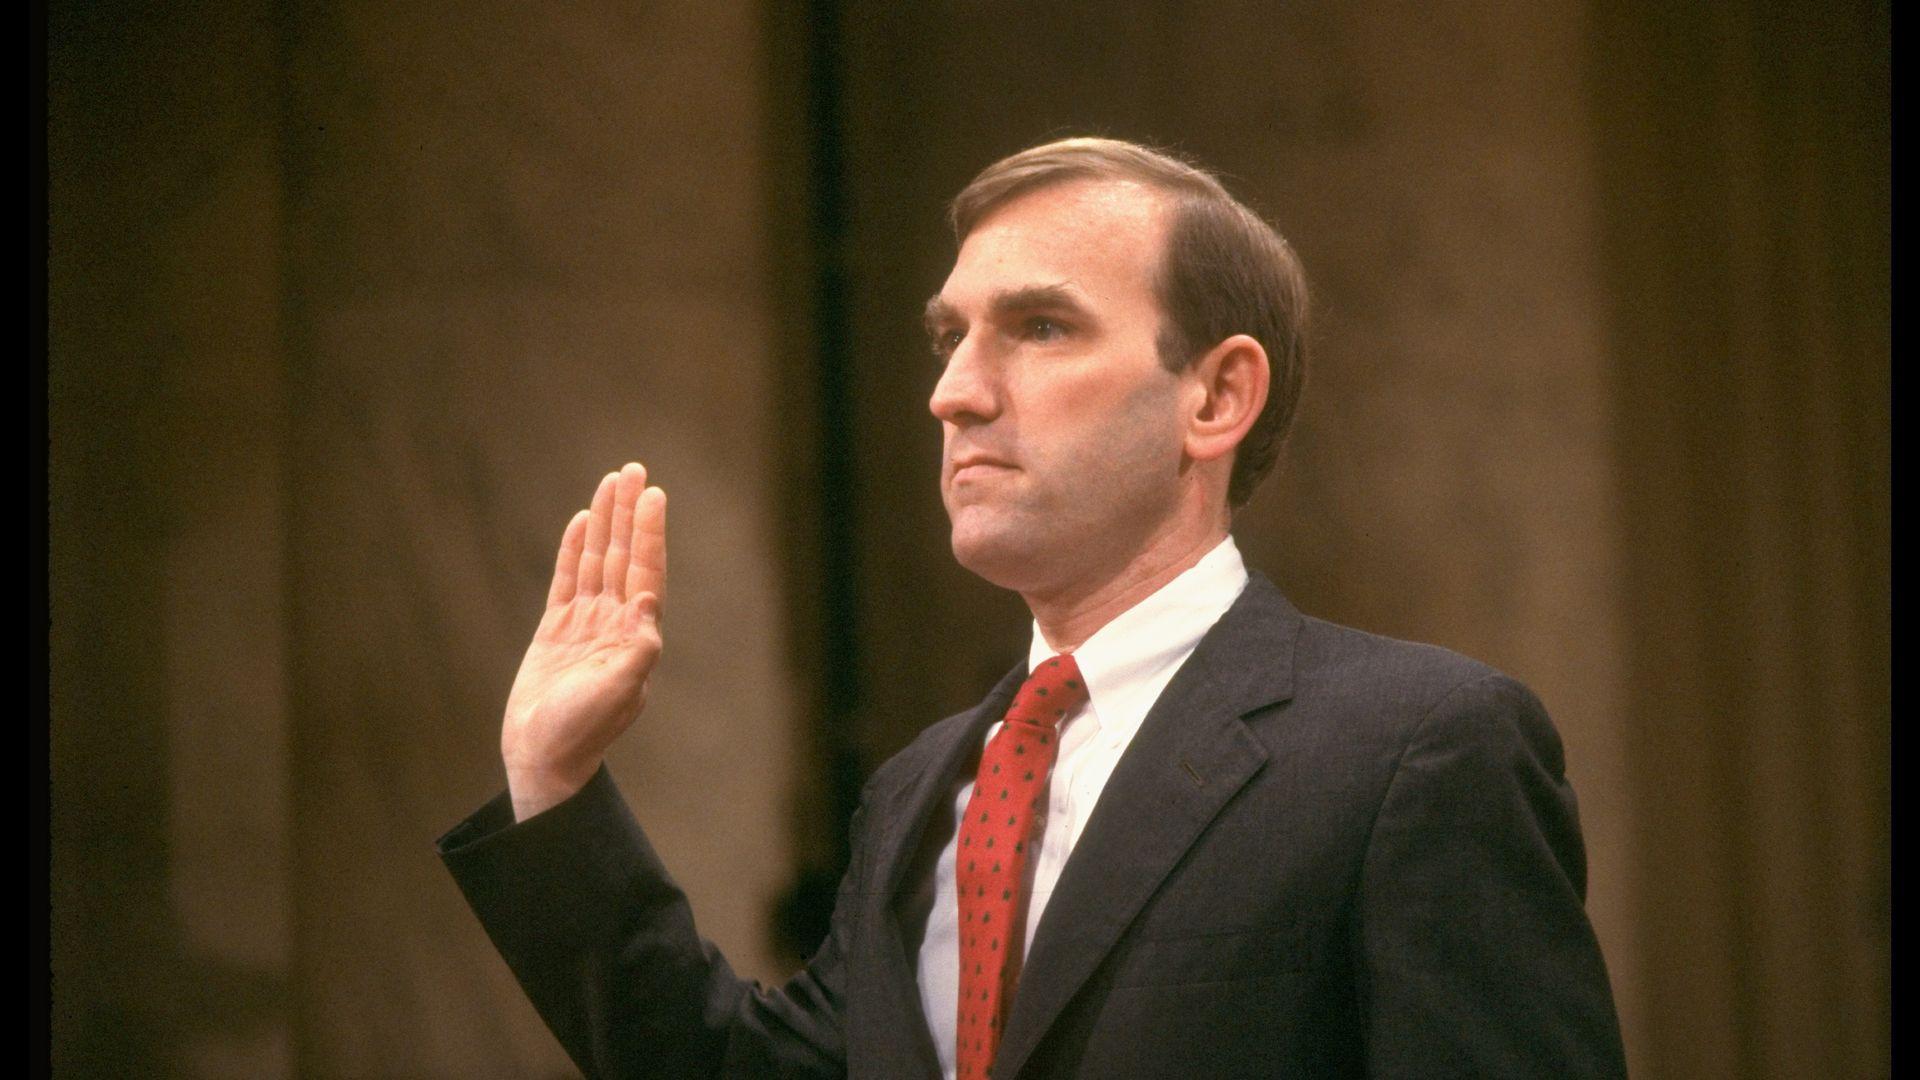 Elliott Abrams being sworn in